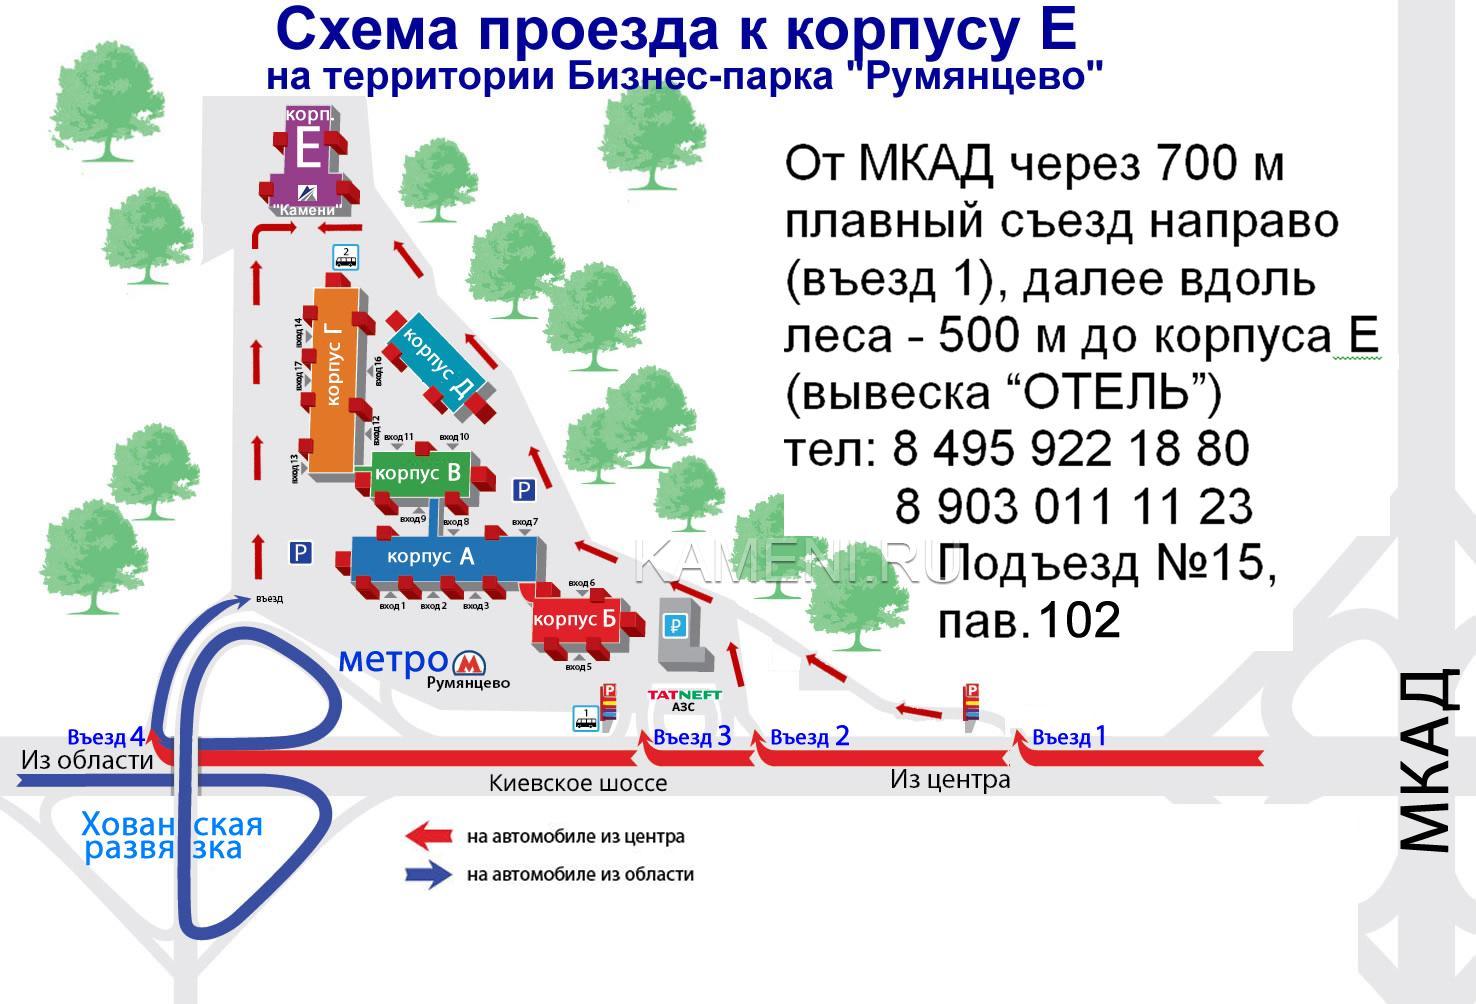 Схема проезда в КАМЕНИ (БП Румянцево)